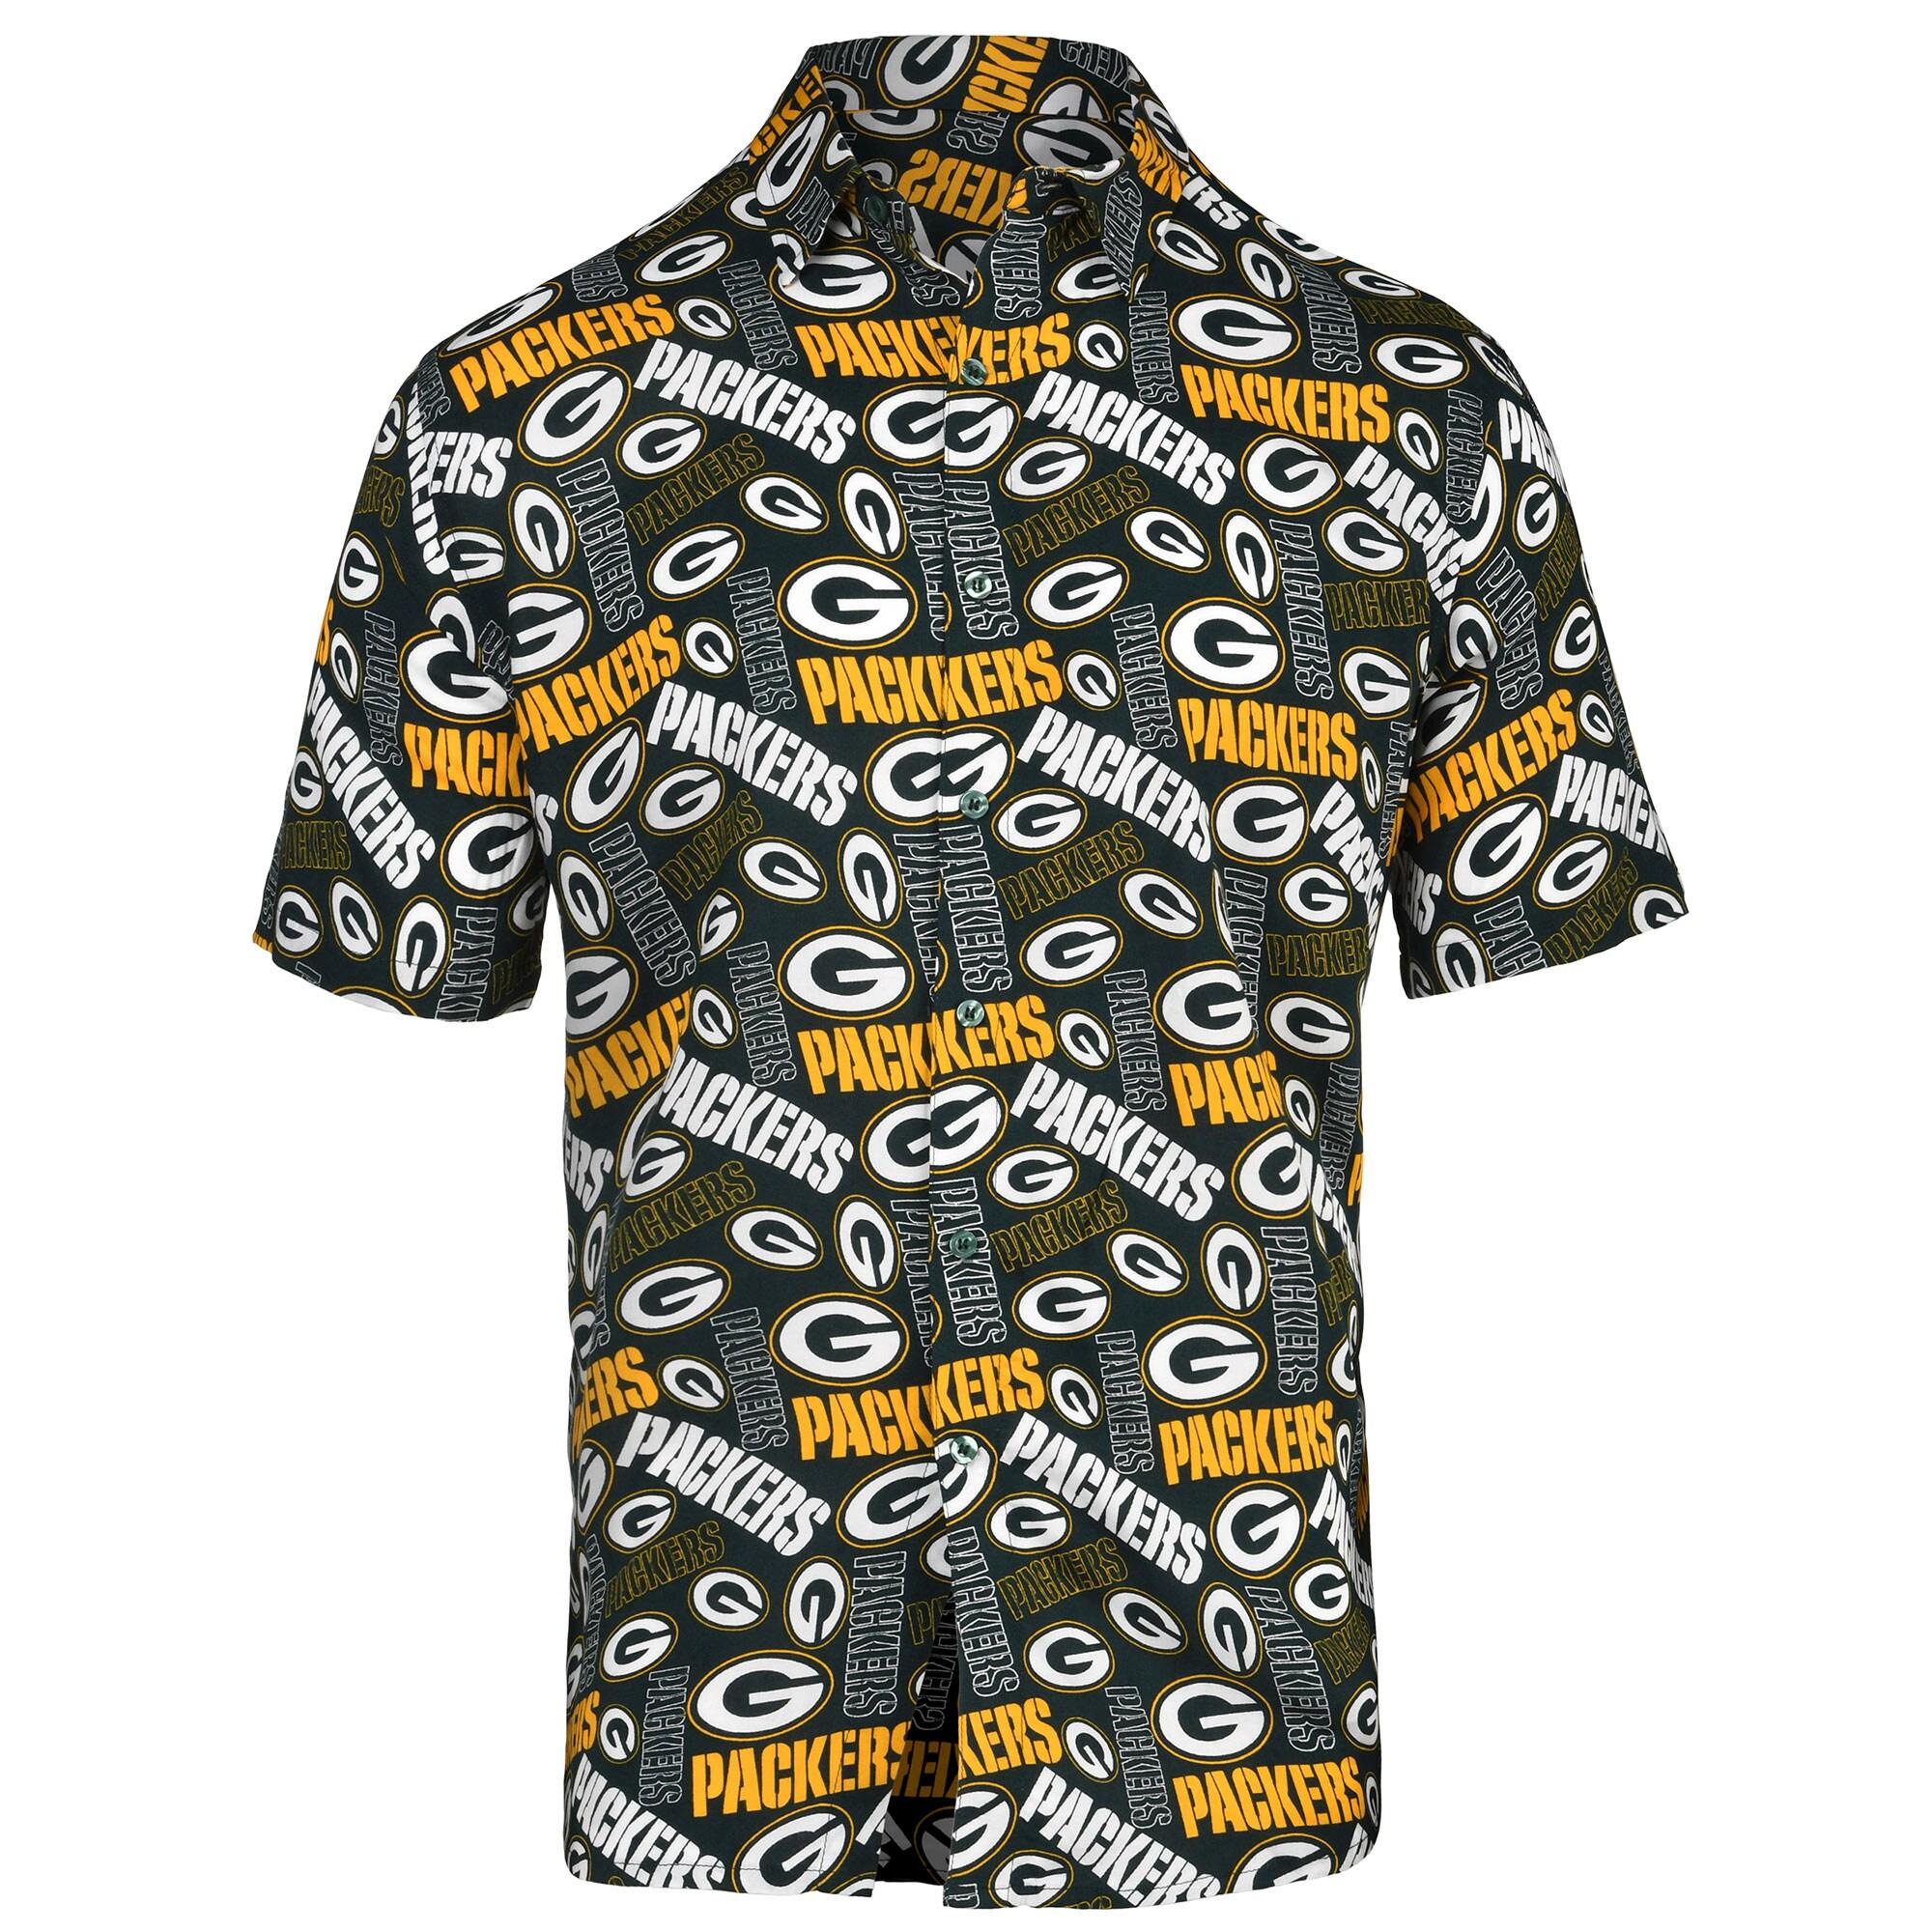 Green Bay Packers Repeat Logo Button-Up Shirt - Green